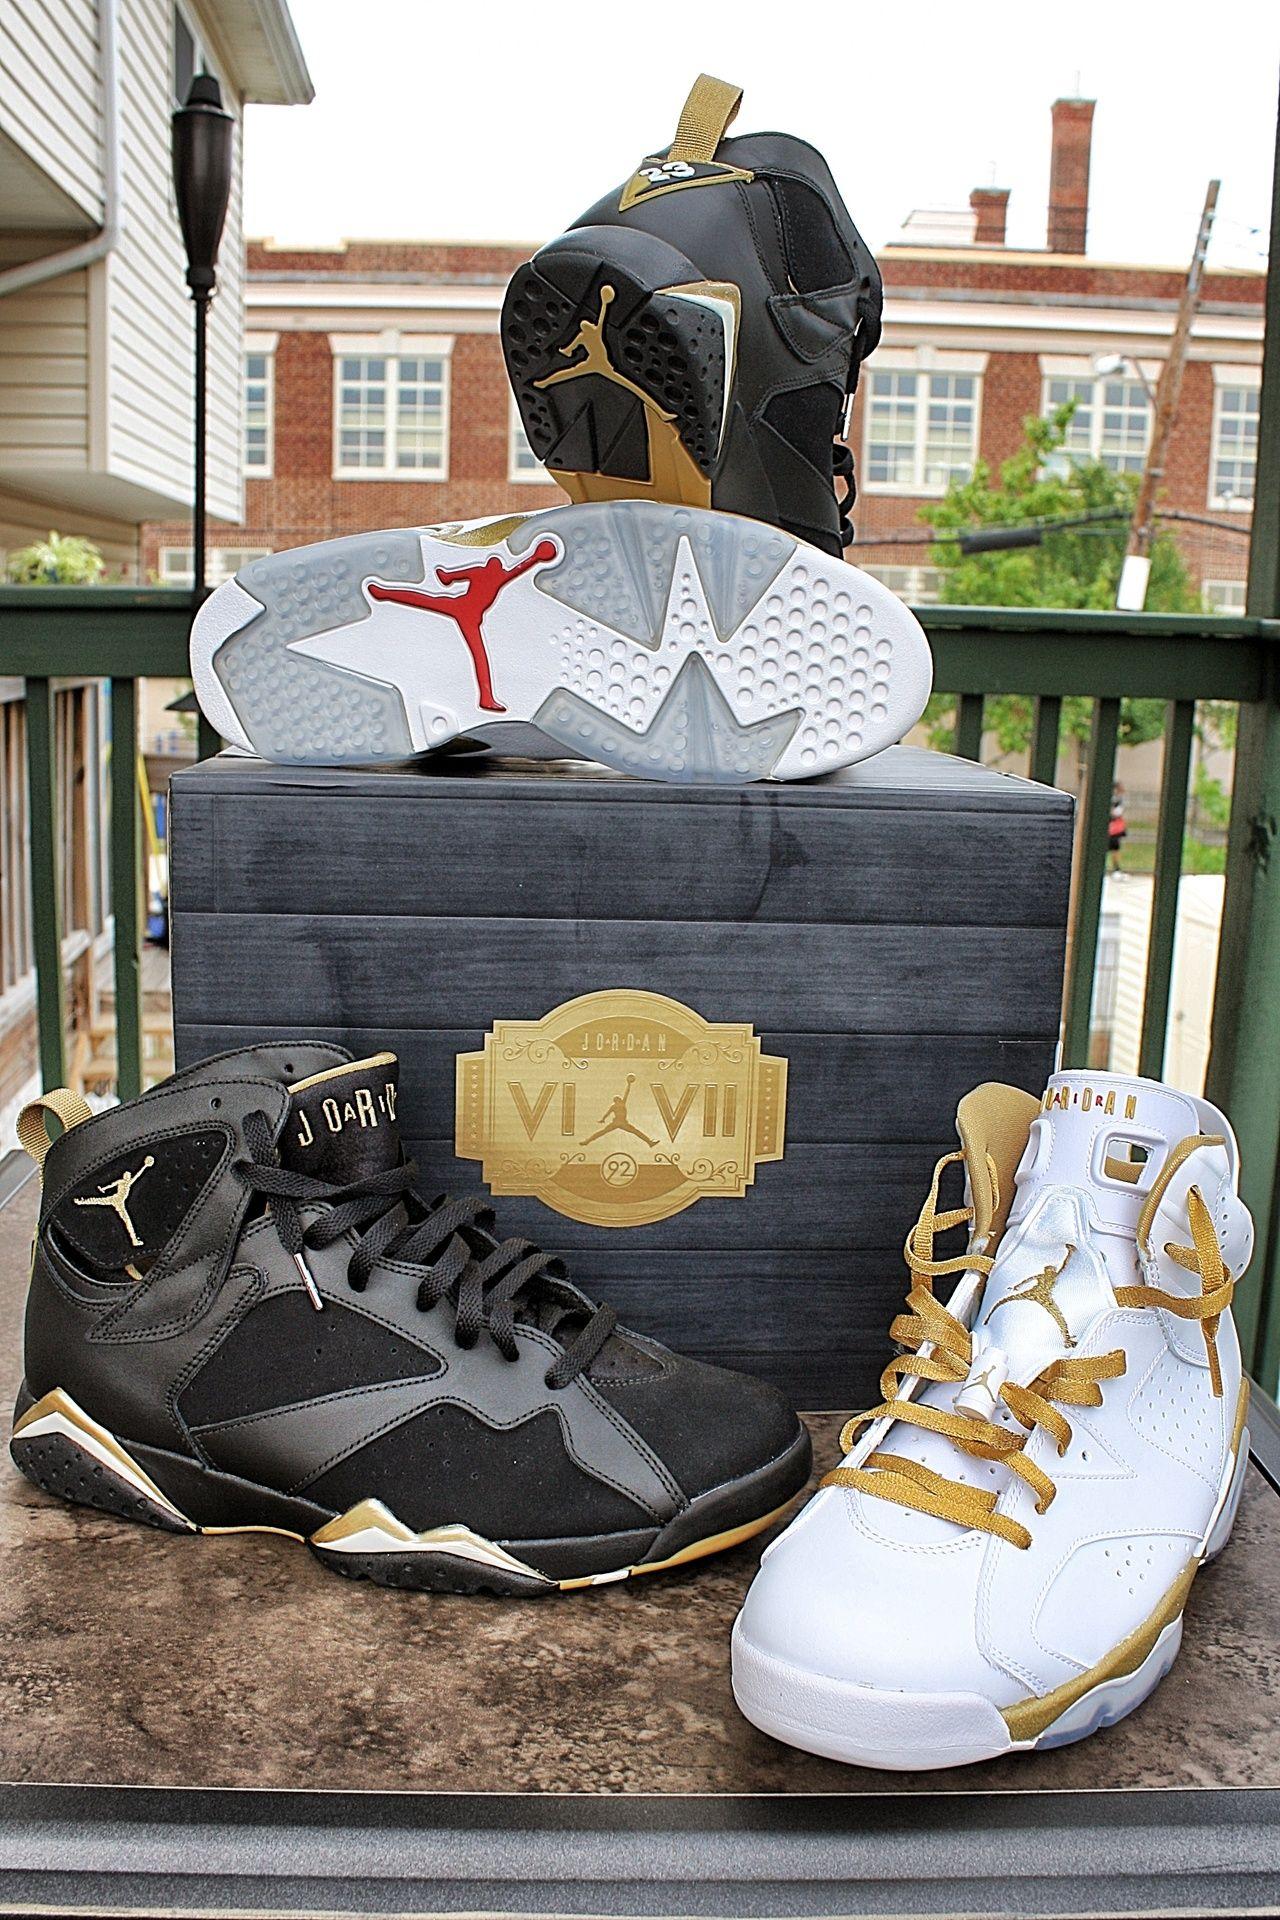 Website For Jordan Sneakers Super Cheap Only 57 8